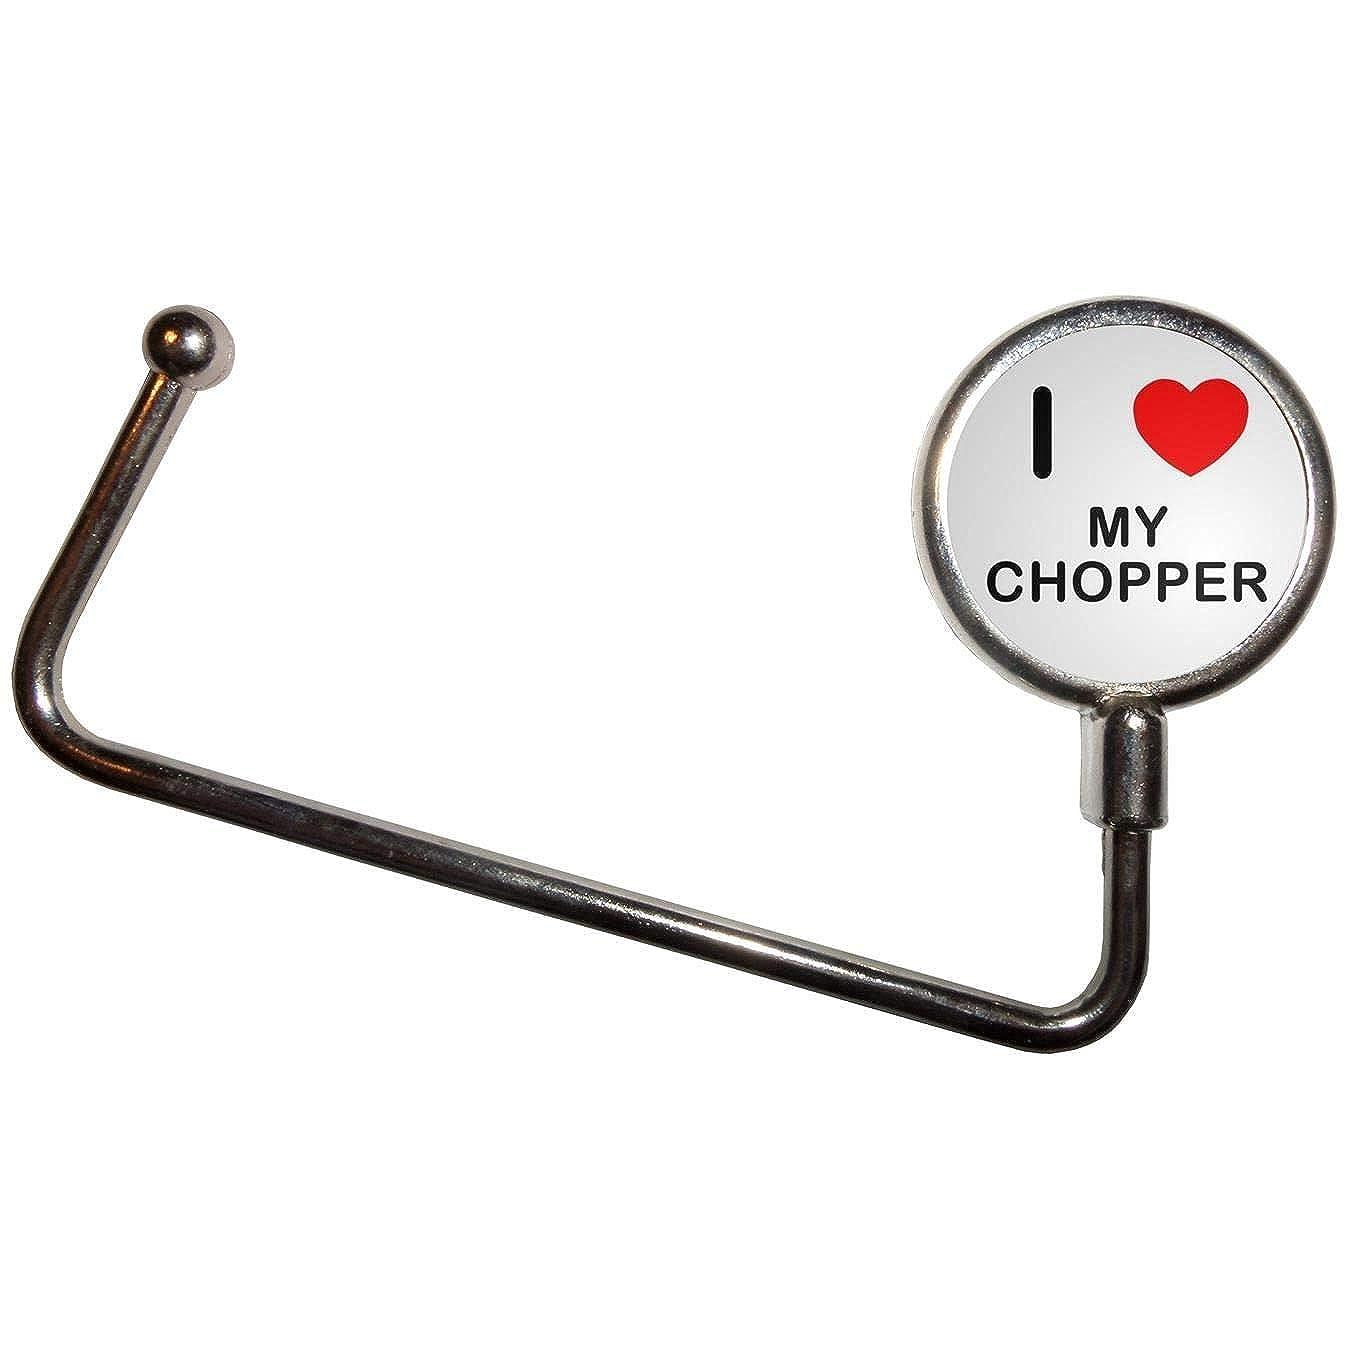 I Love My Chopper Handbag Table Hook Hanger